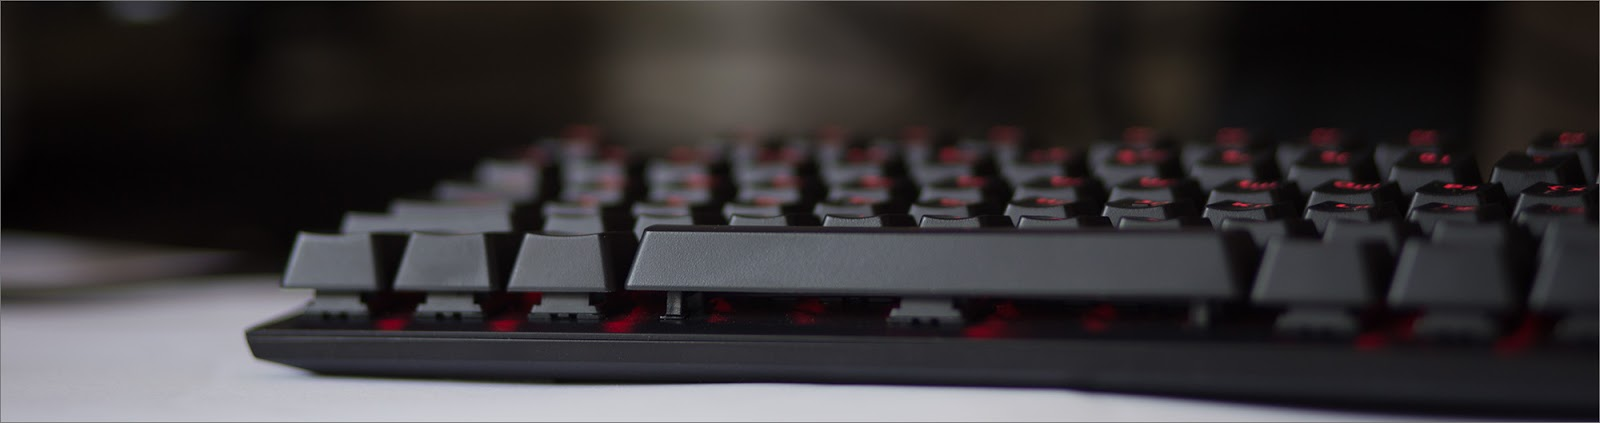 HyperX Alloy FPS — надёжность превыше всего - 25